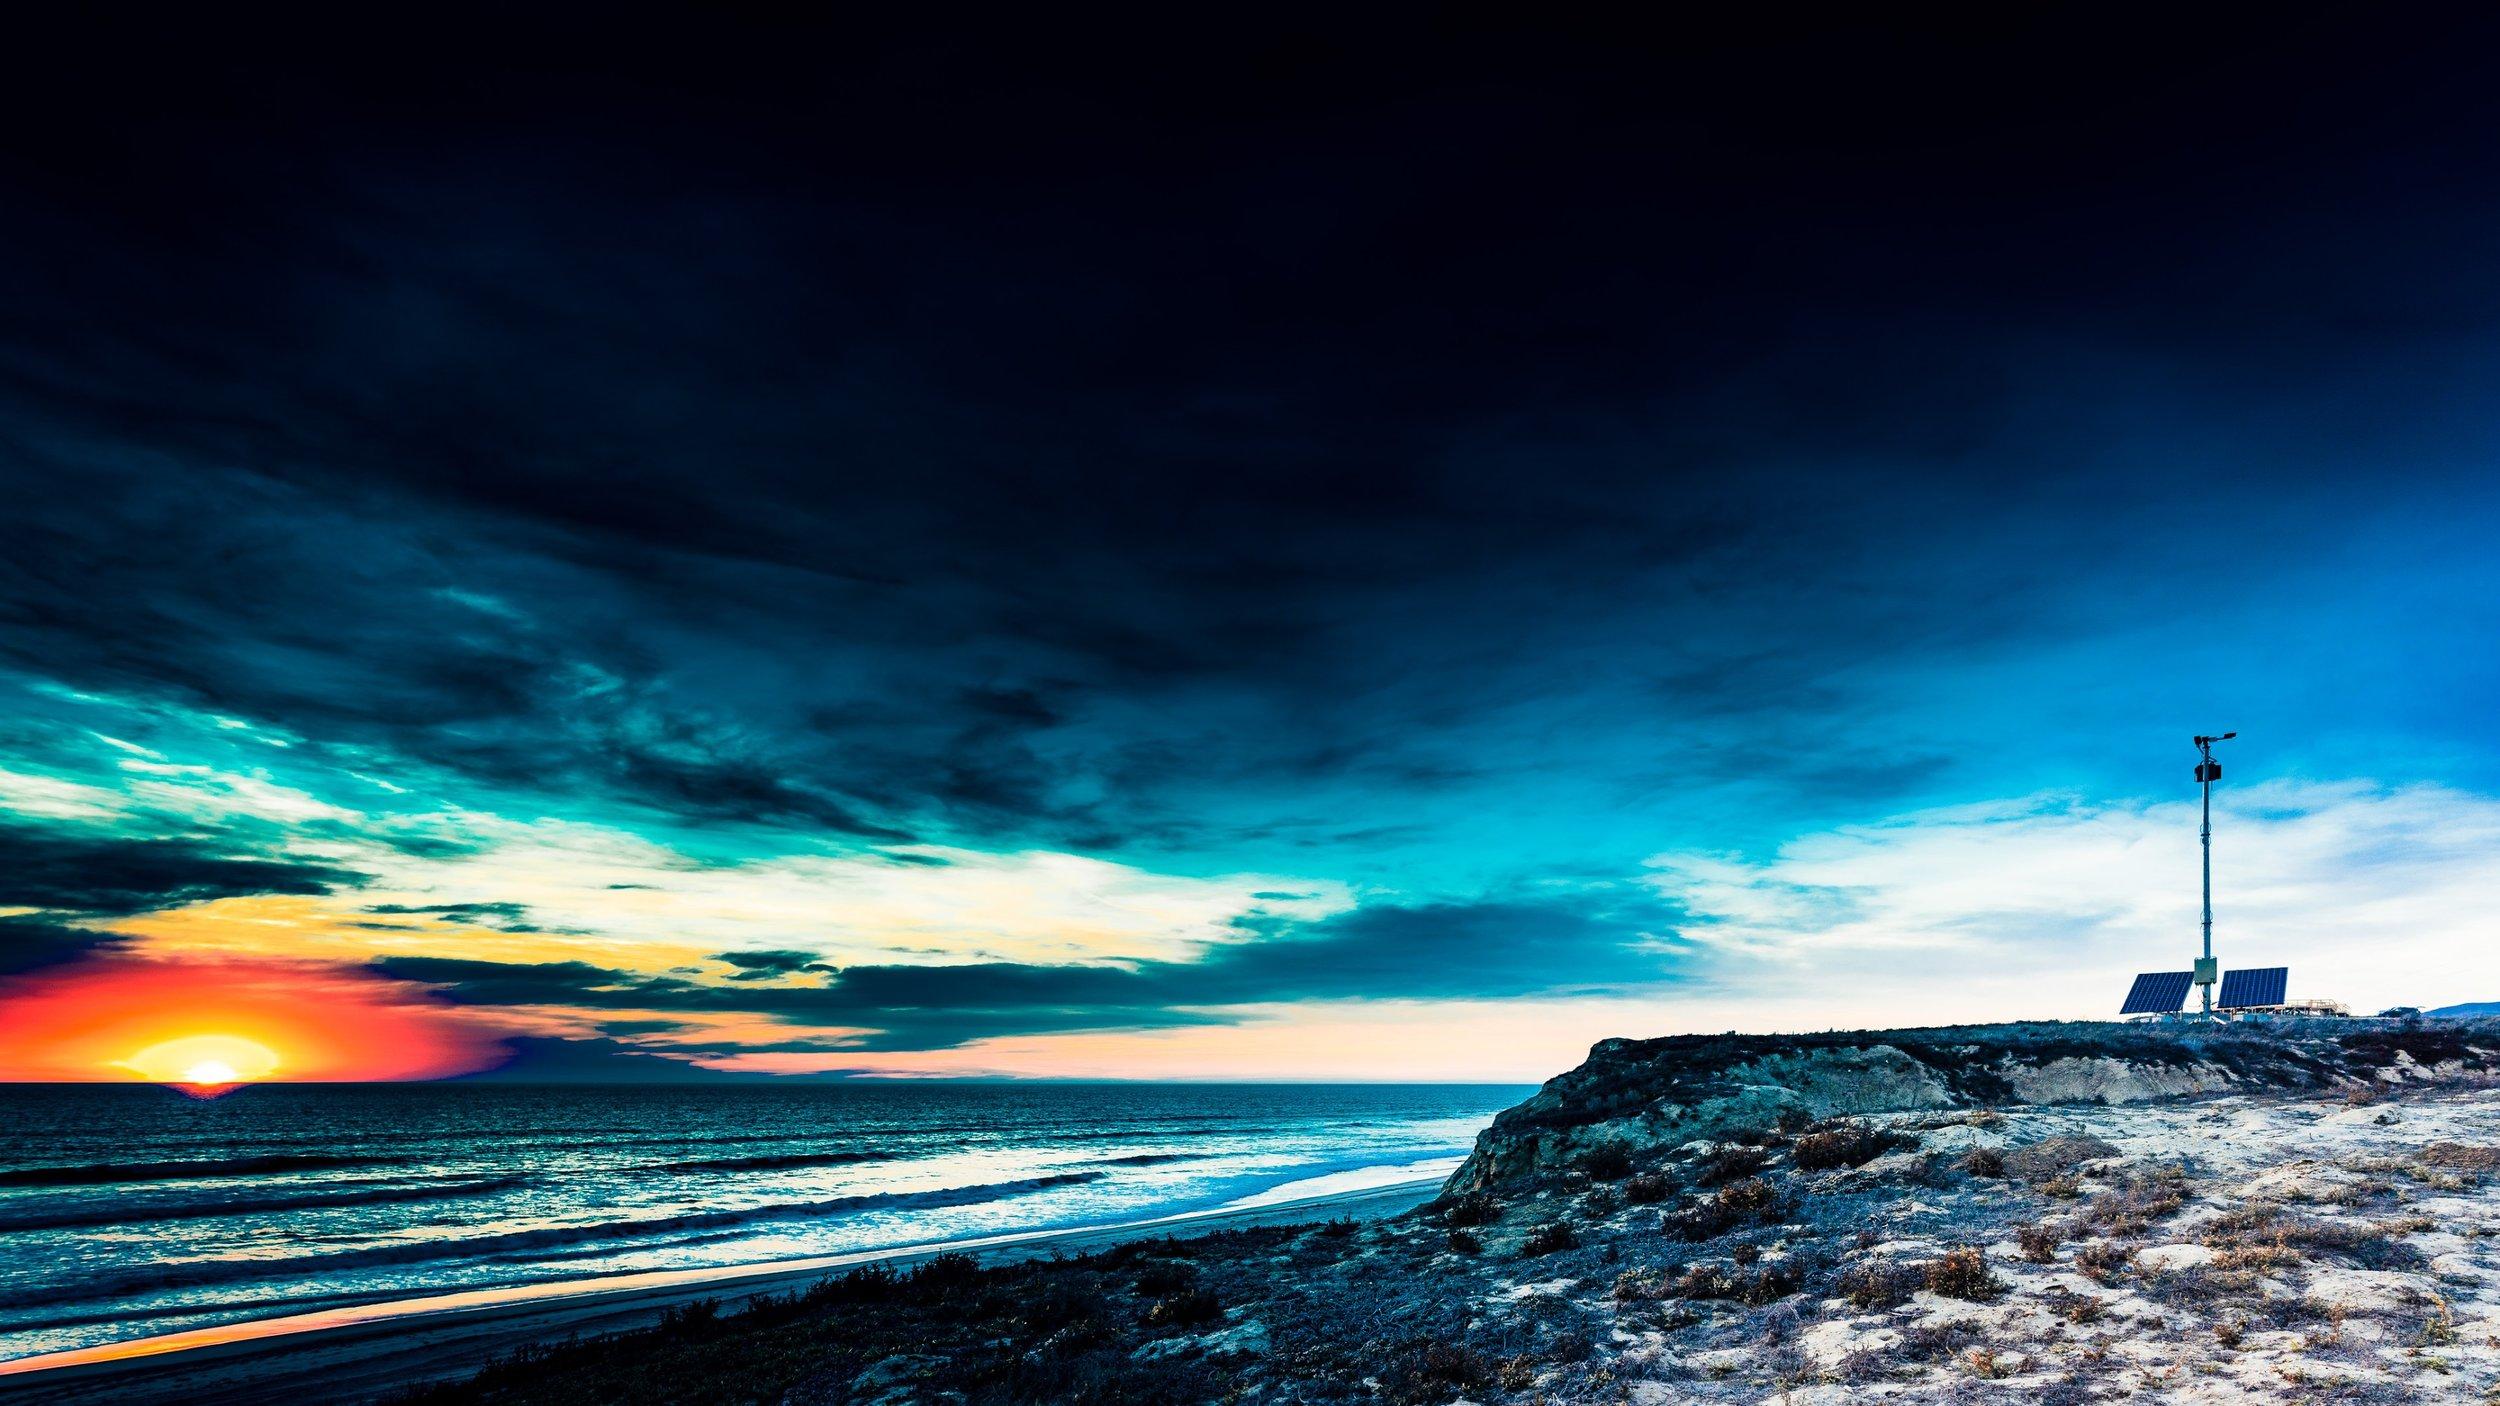 anduril-ai-tower-coast-ocean-12.jpg